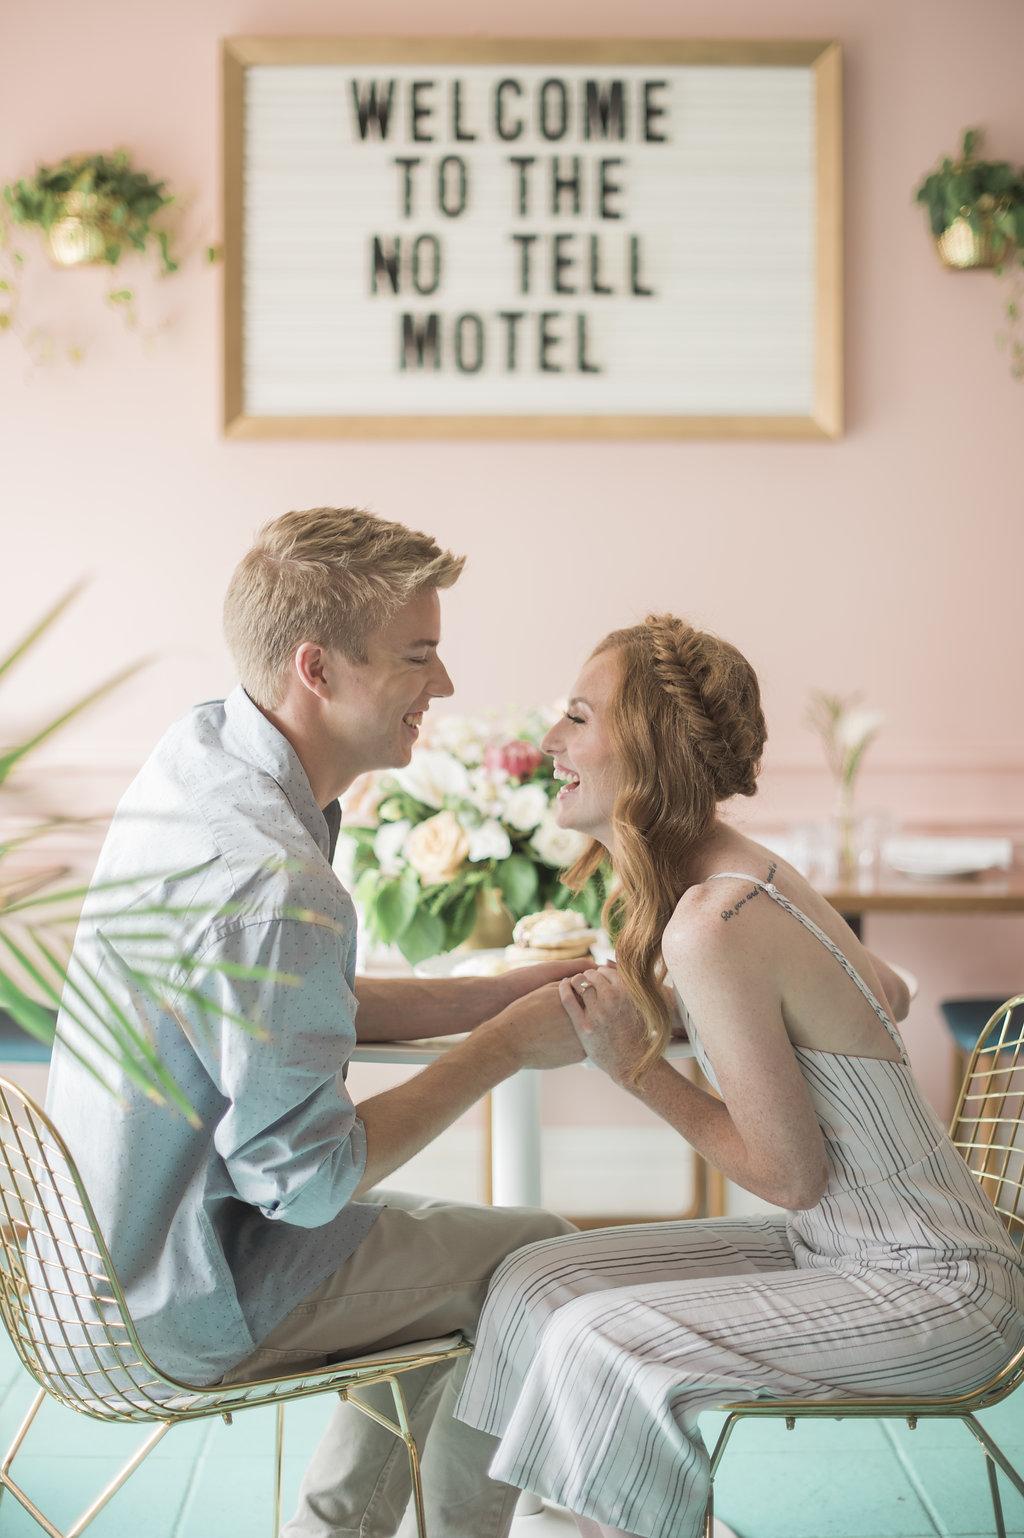 Motel-Restaurant-Editorial-Vineyard-Bride-photo-by-Blynda-DaCosta-Photography-020.JPG